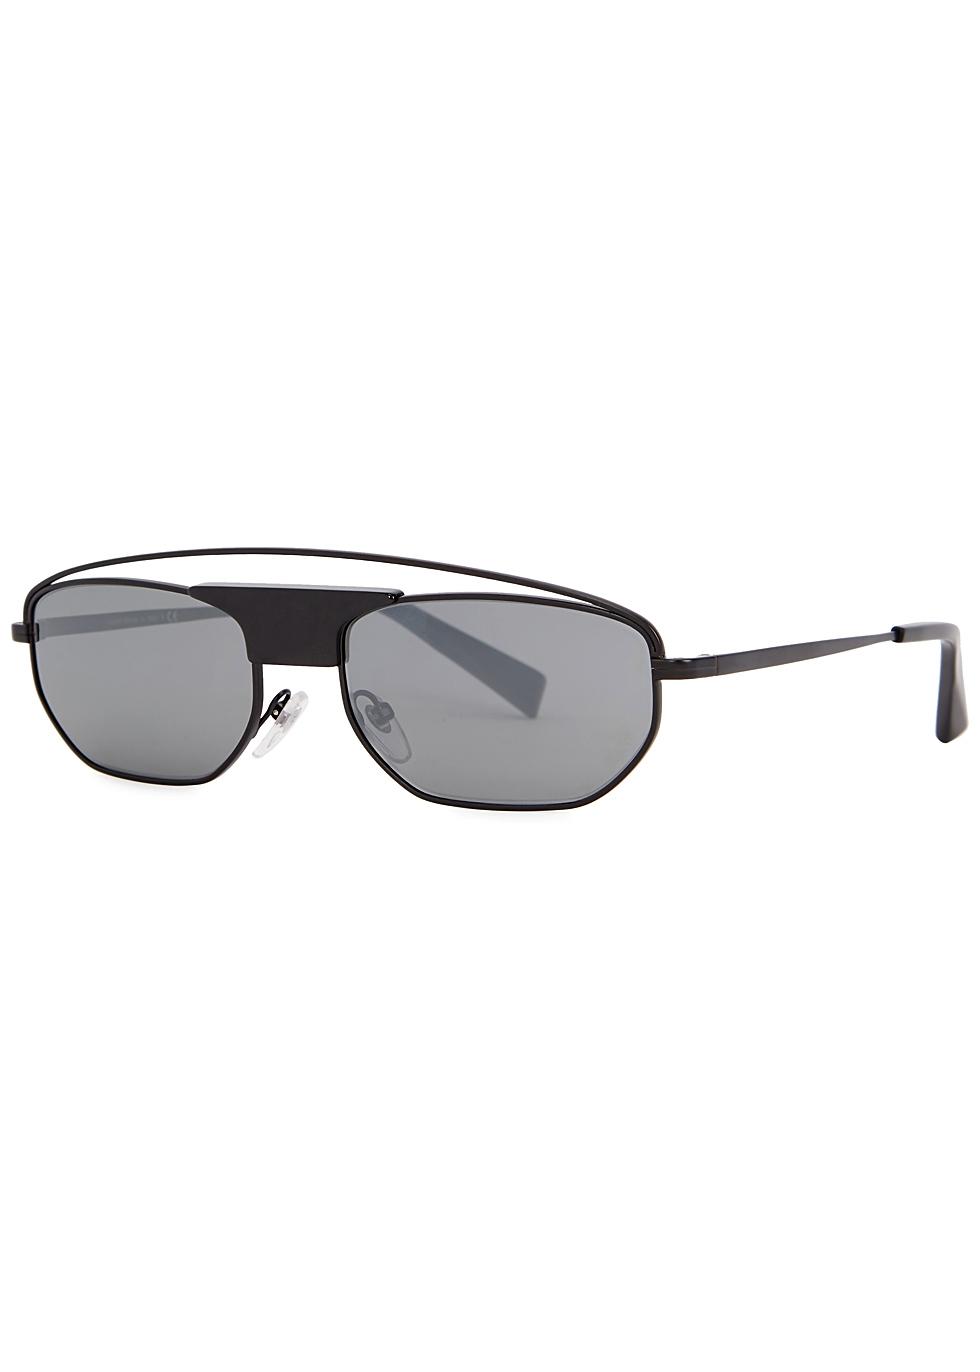 ALAIN MIKLI Plaisir Rectangle-Frame Sunglasses in Black